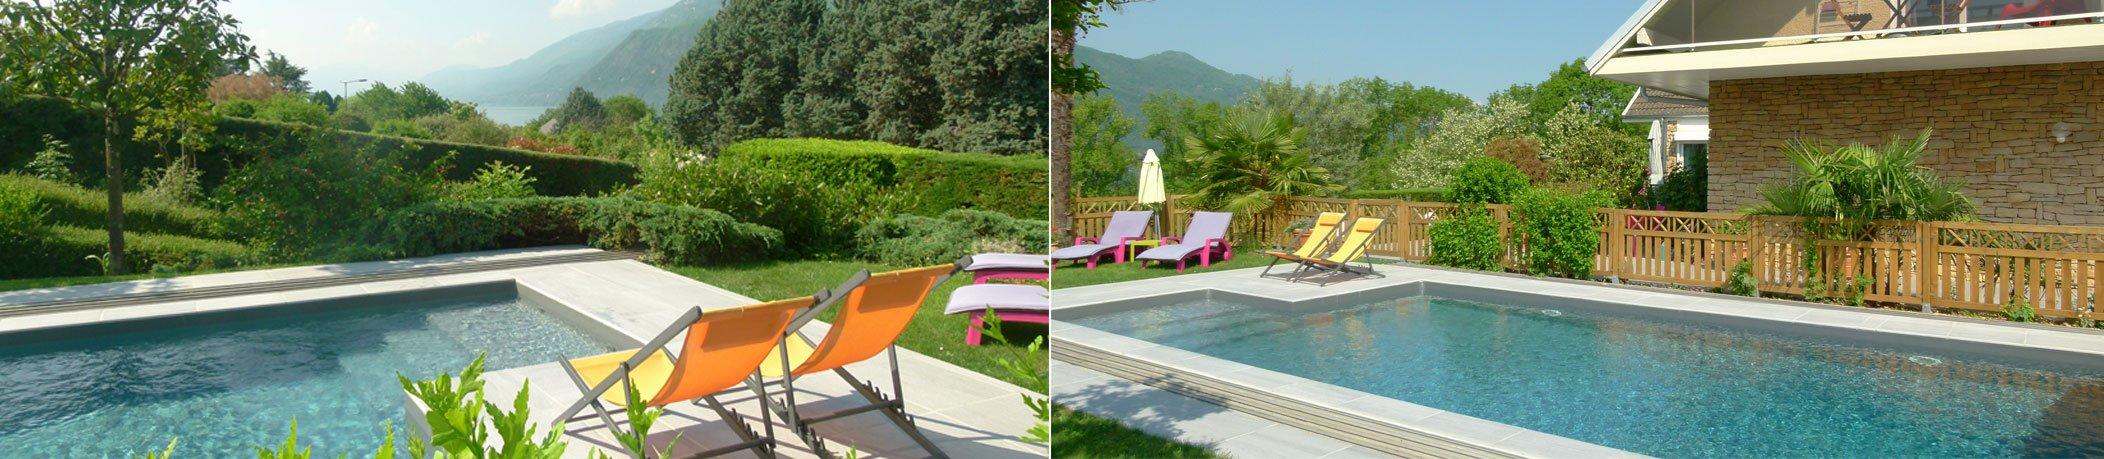 photo piscine et terrasse gîte au petit nice